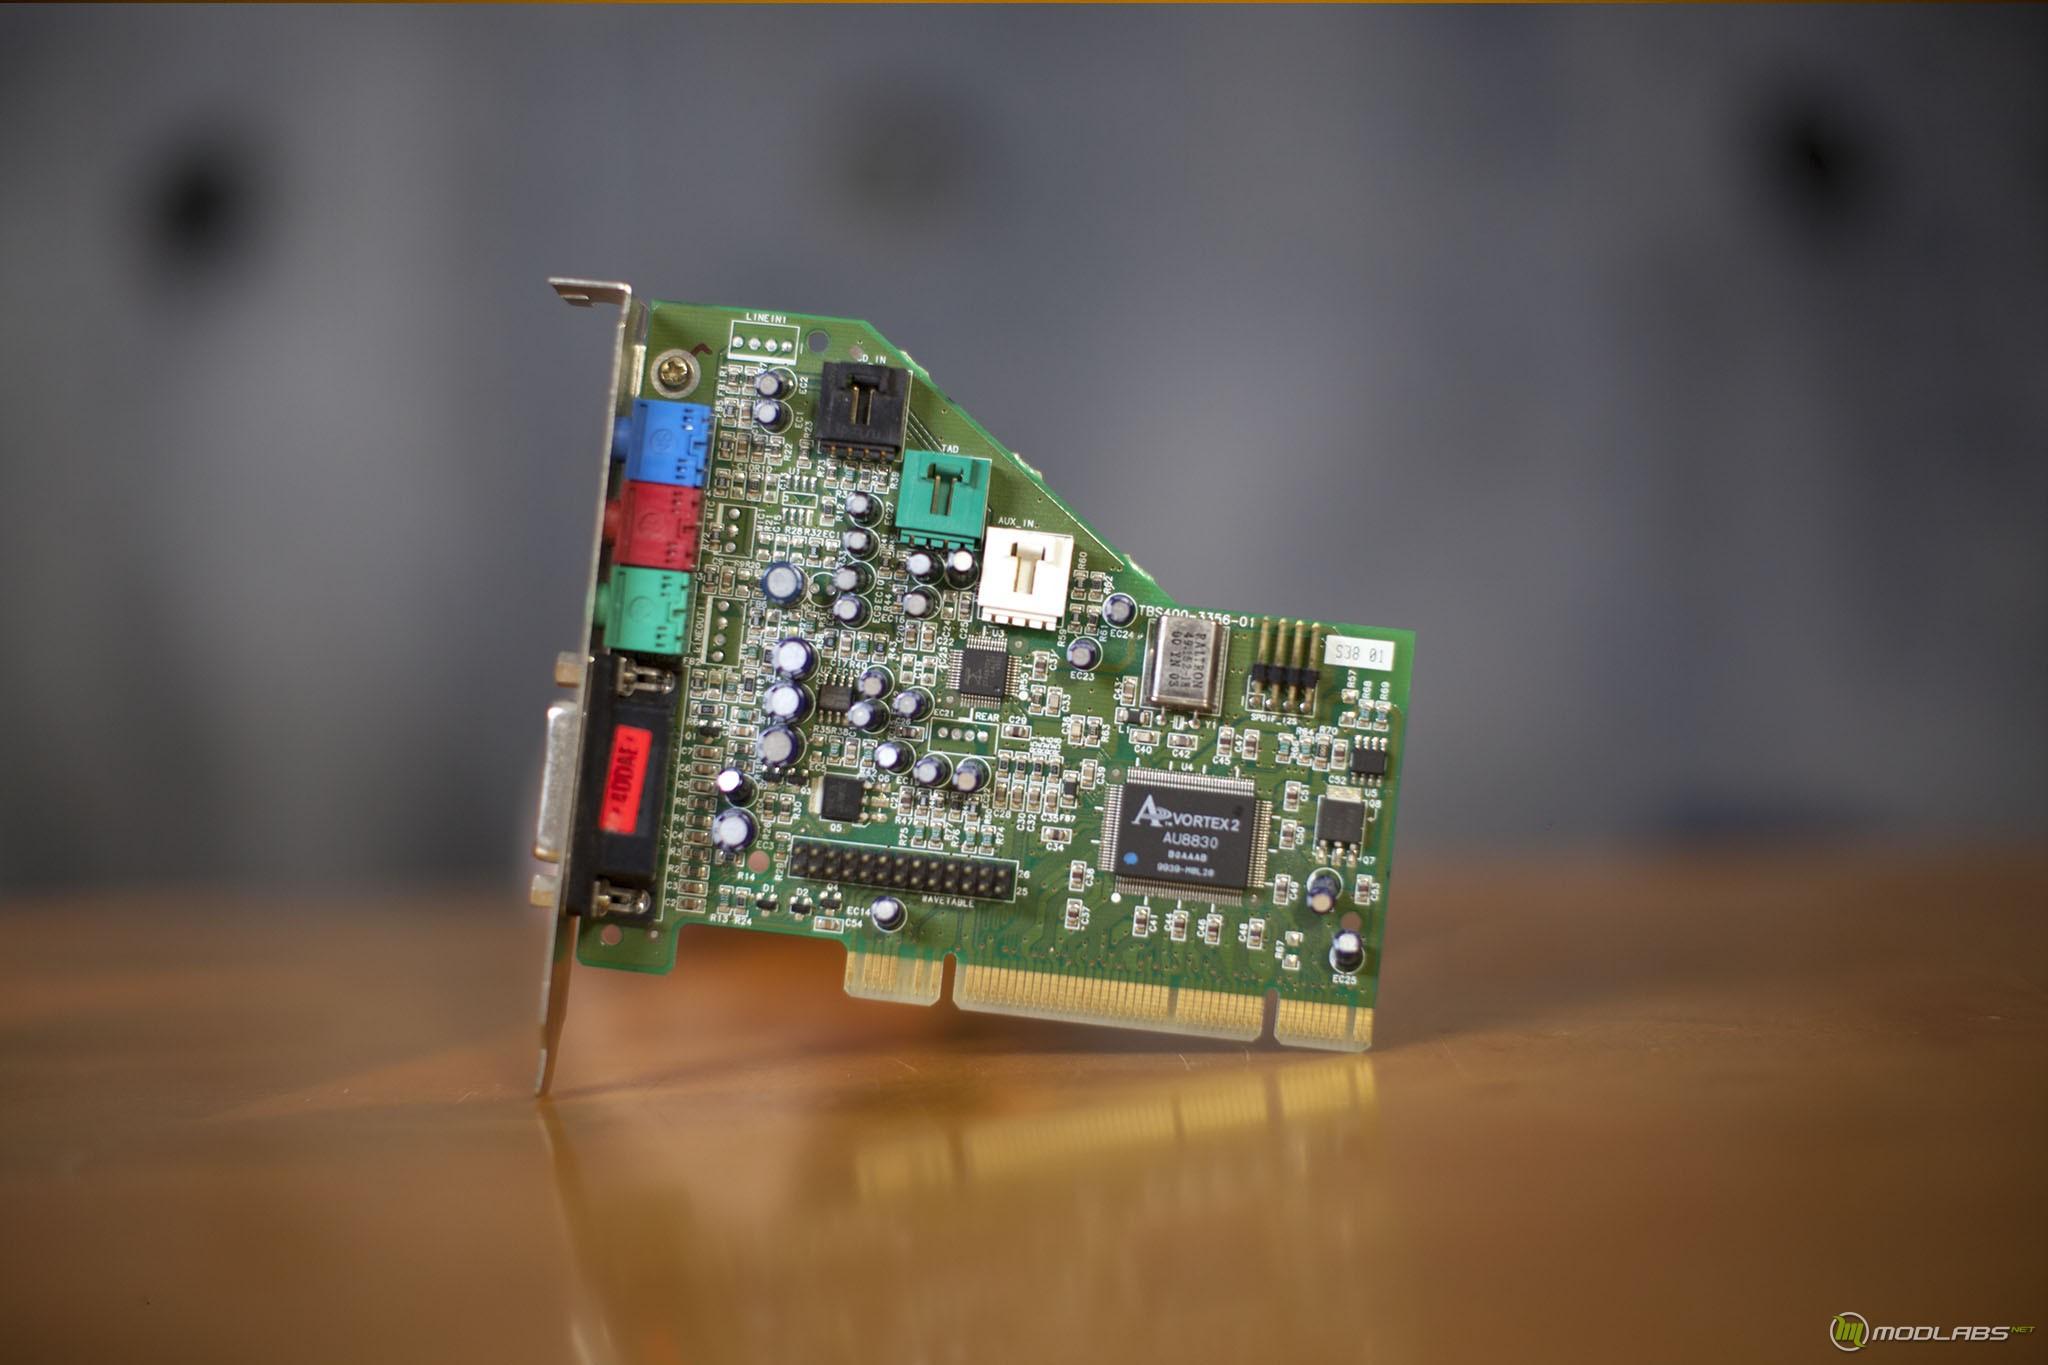 Drivers Aureal Vortex 8830 Audio Wdm For Windows 7 64bit ...